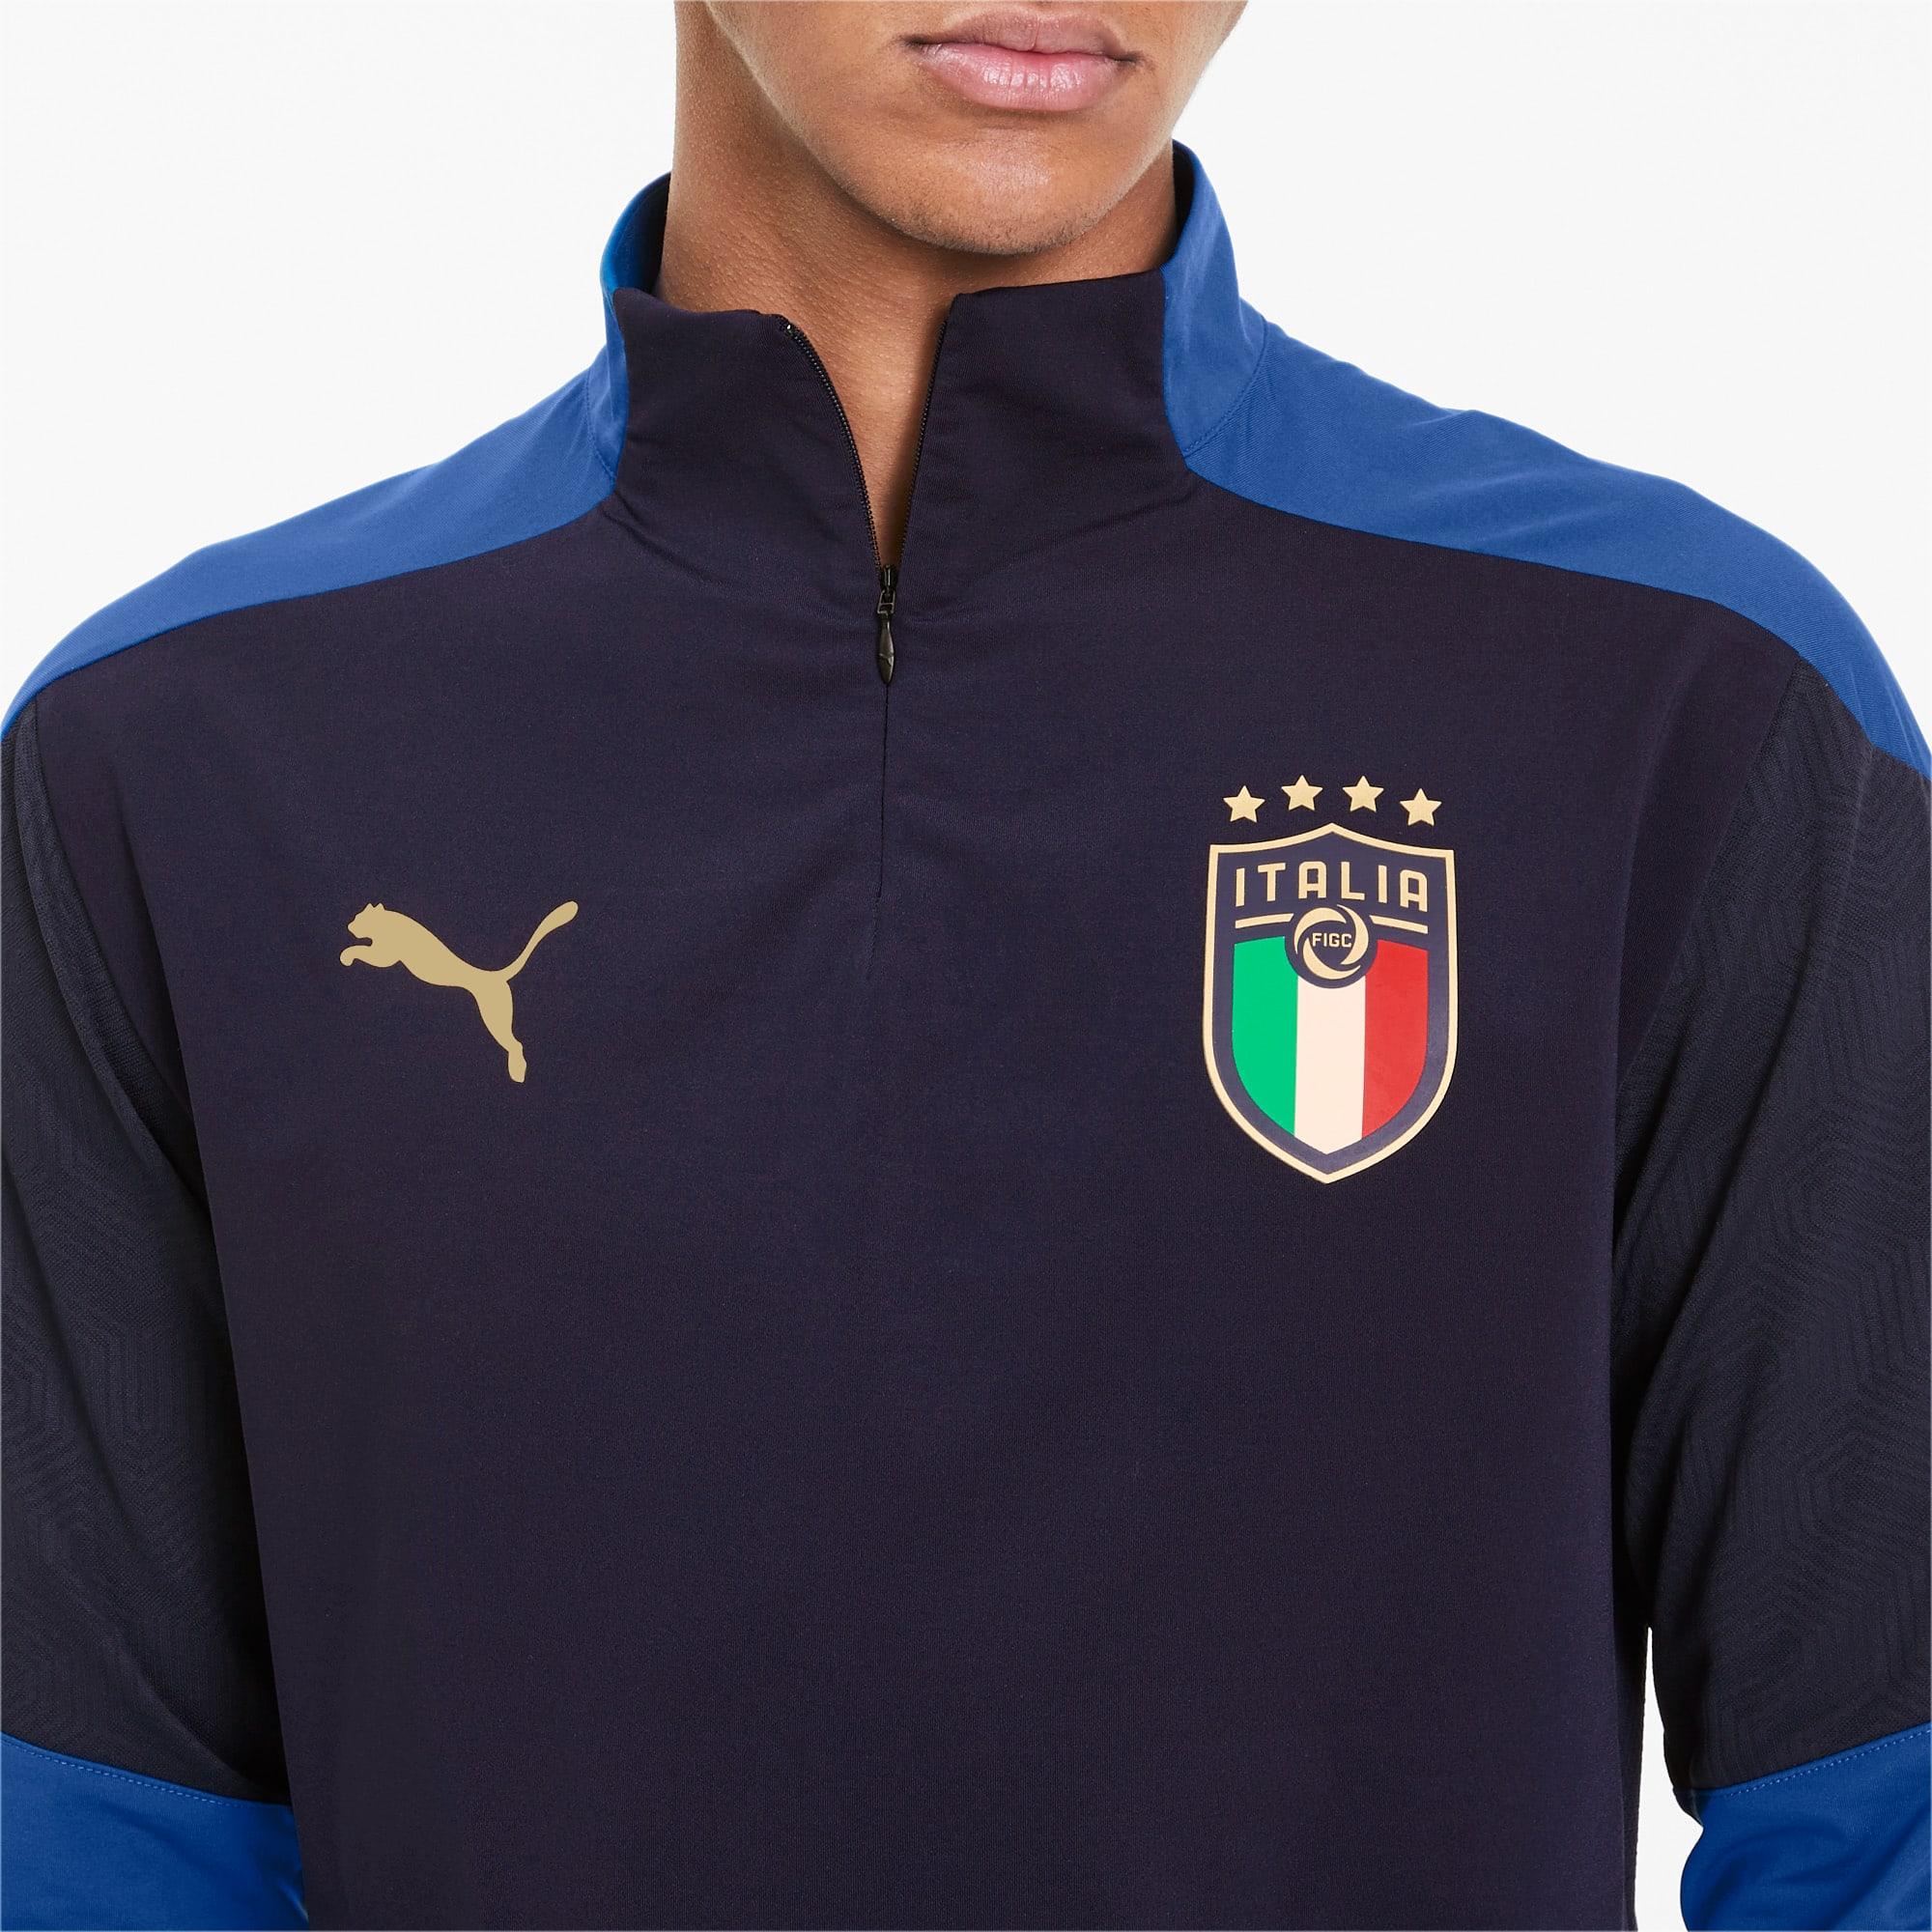 Sweat Italia Training pour homme